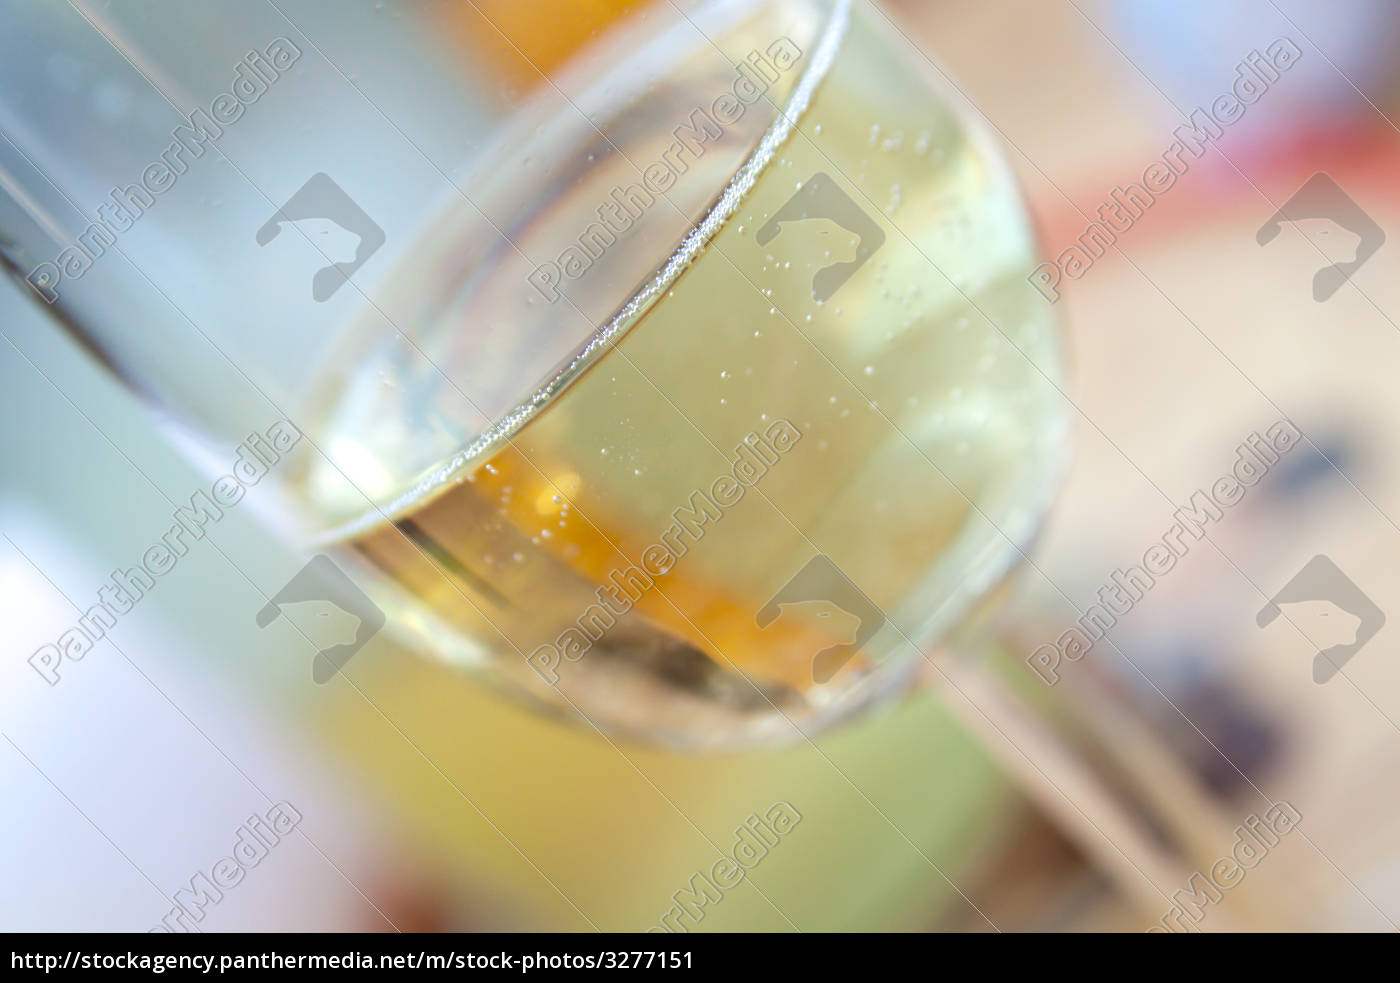 champagne, glass - 3277151